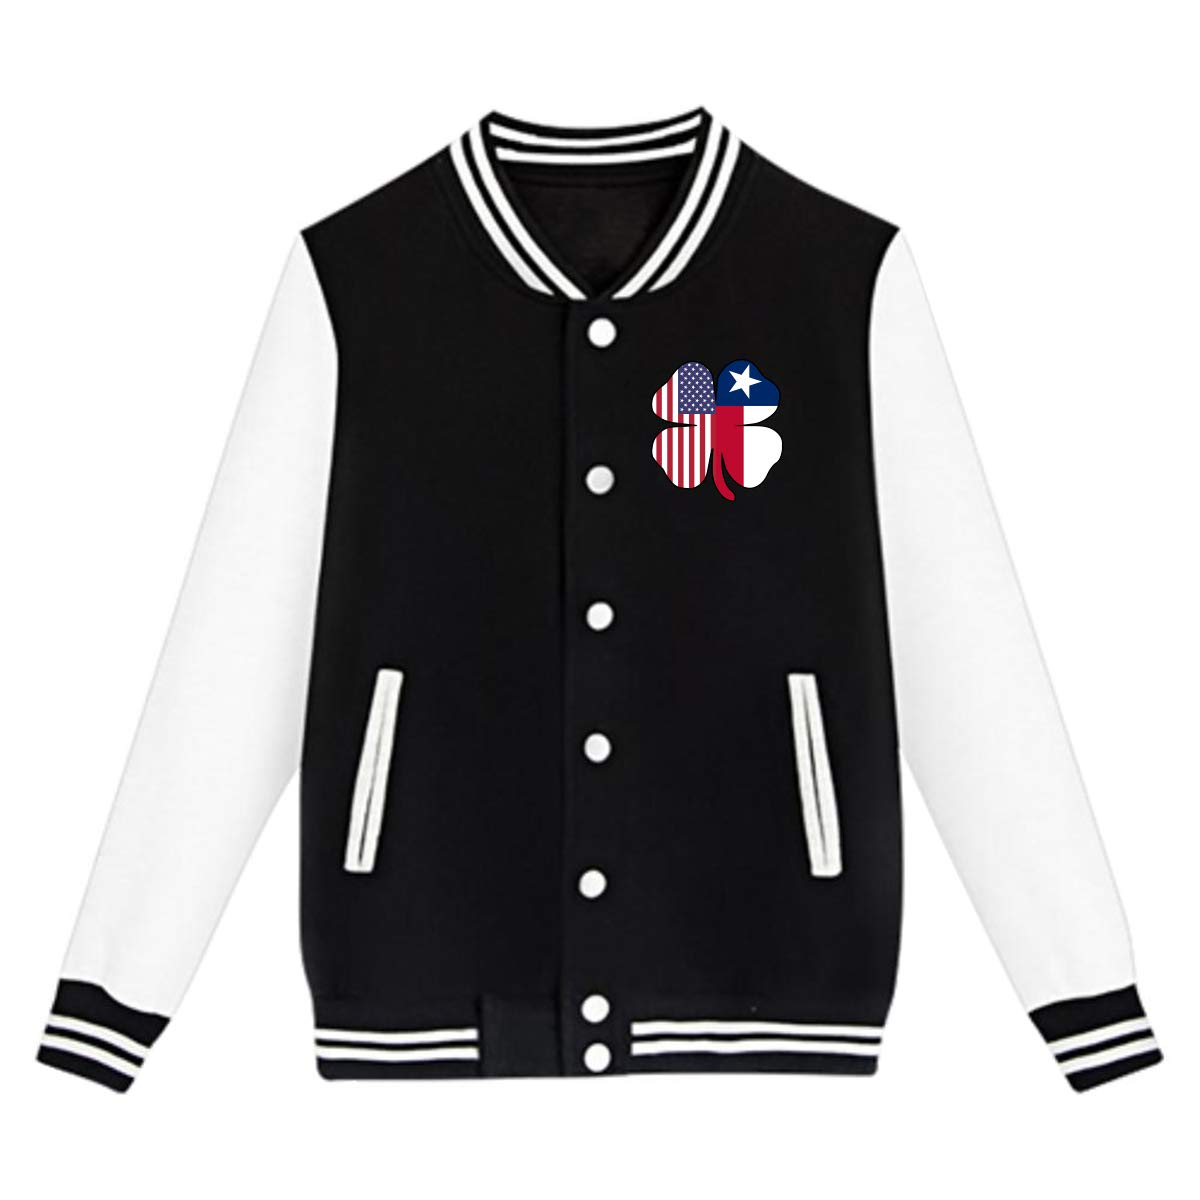 NJKM5MJ Unisex Youth Baseball Uniform Jacket American Texas Flag Shamrock Hoodie Sweatshirt Sweater Tee